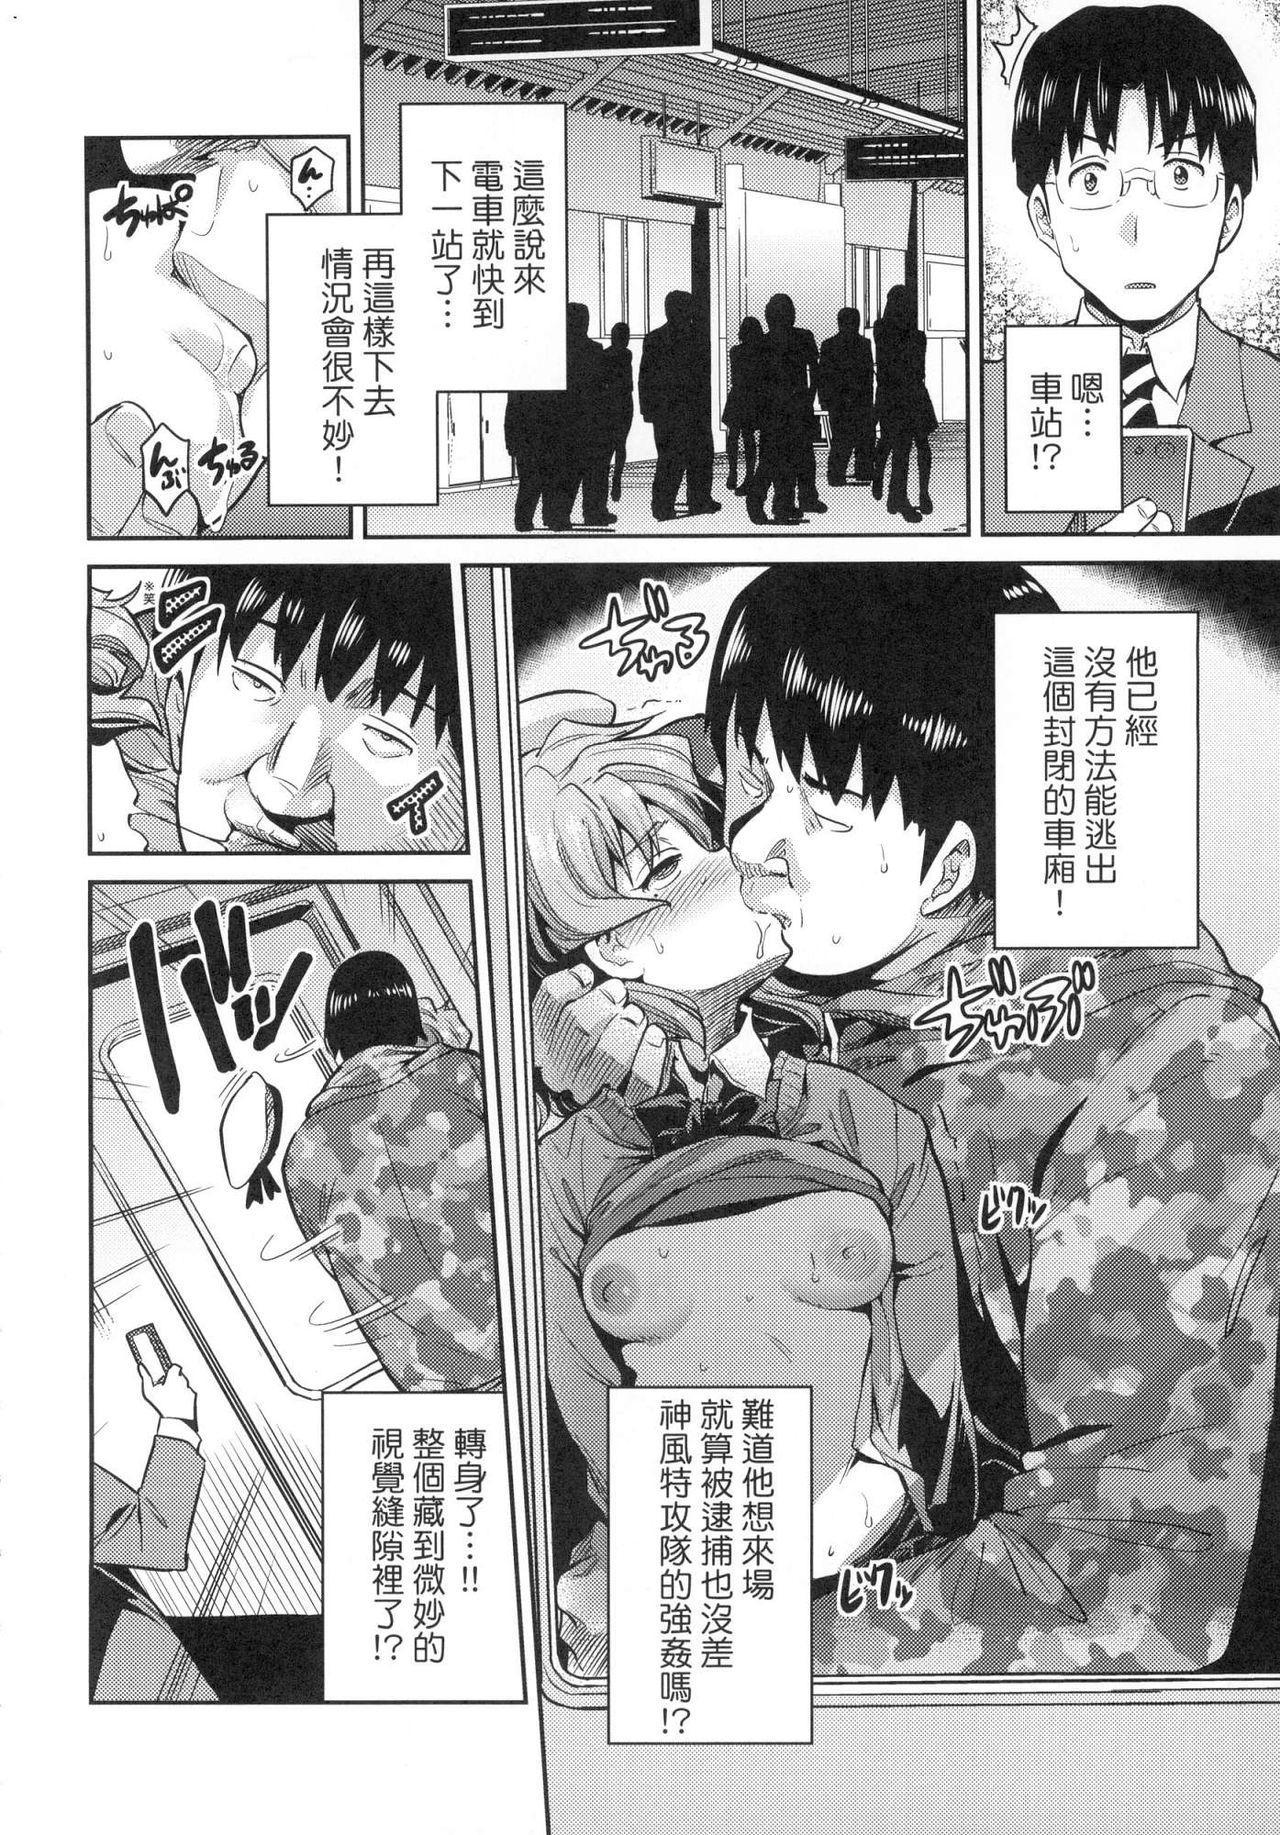 Kyousei Tanetsuke Express - Forced Seeding Express 17